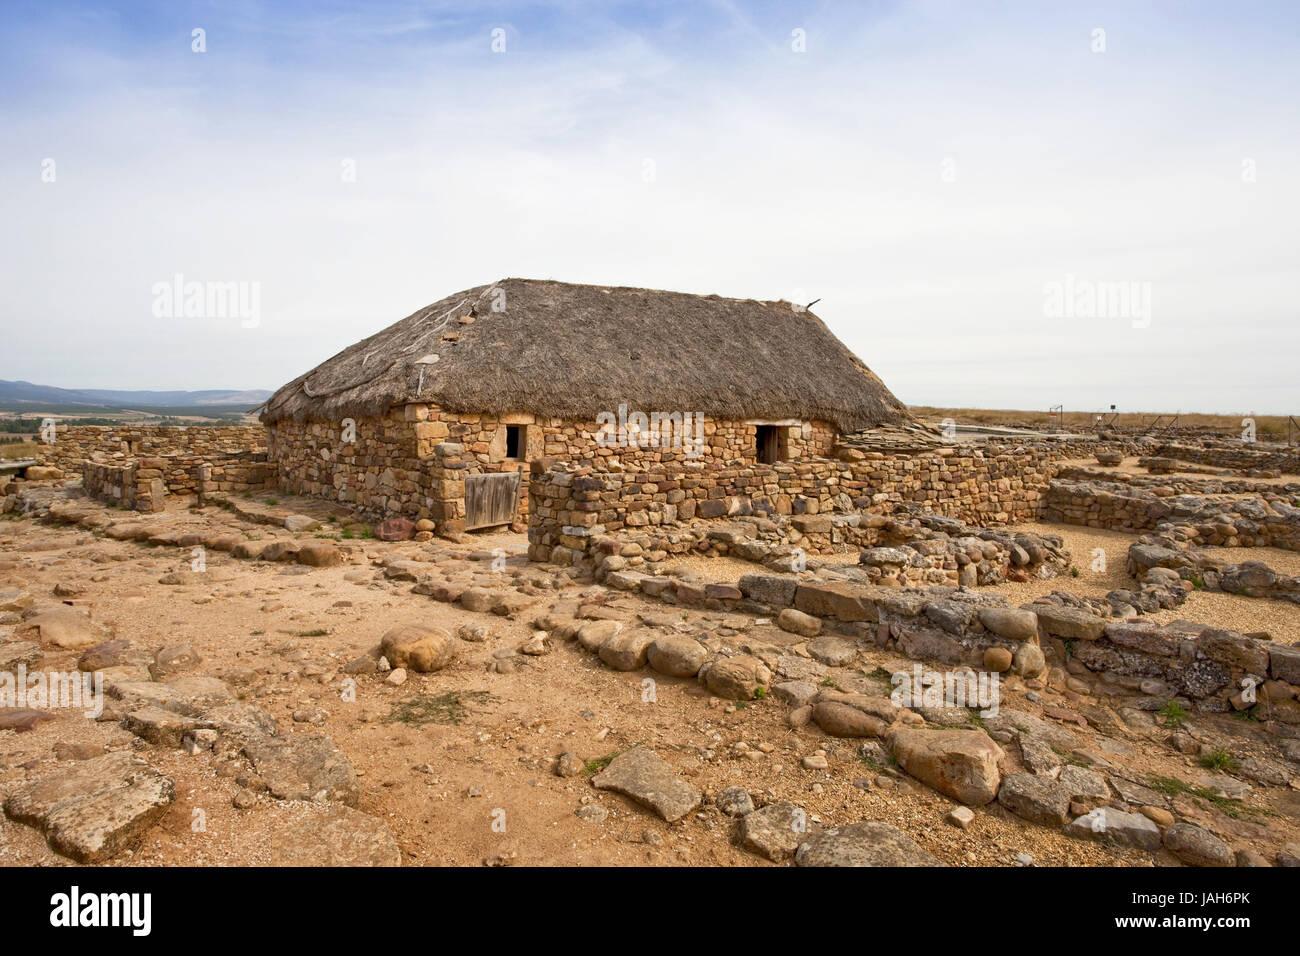 Spain,province of Soria,ruins of Numancia, - Stock Image